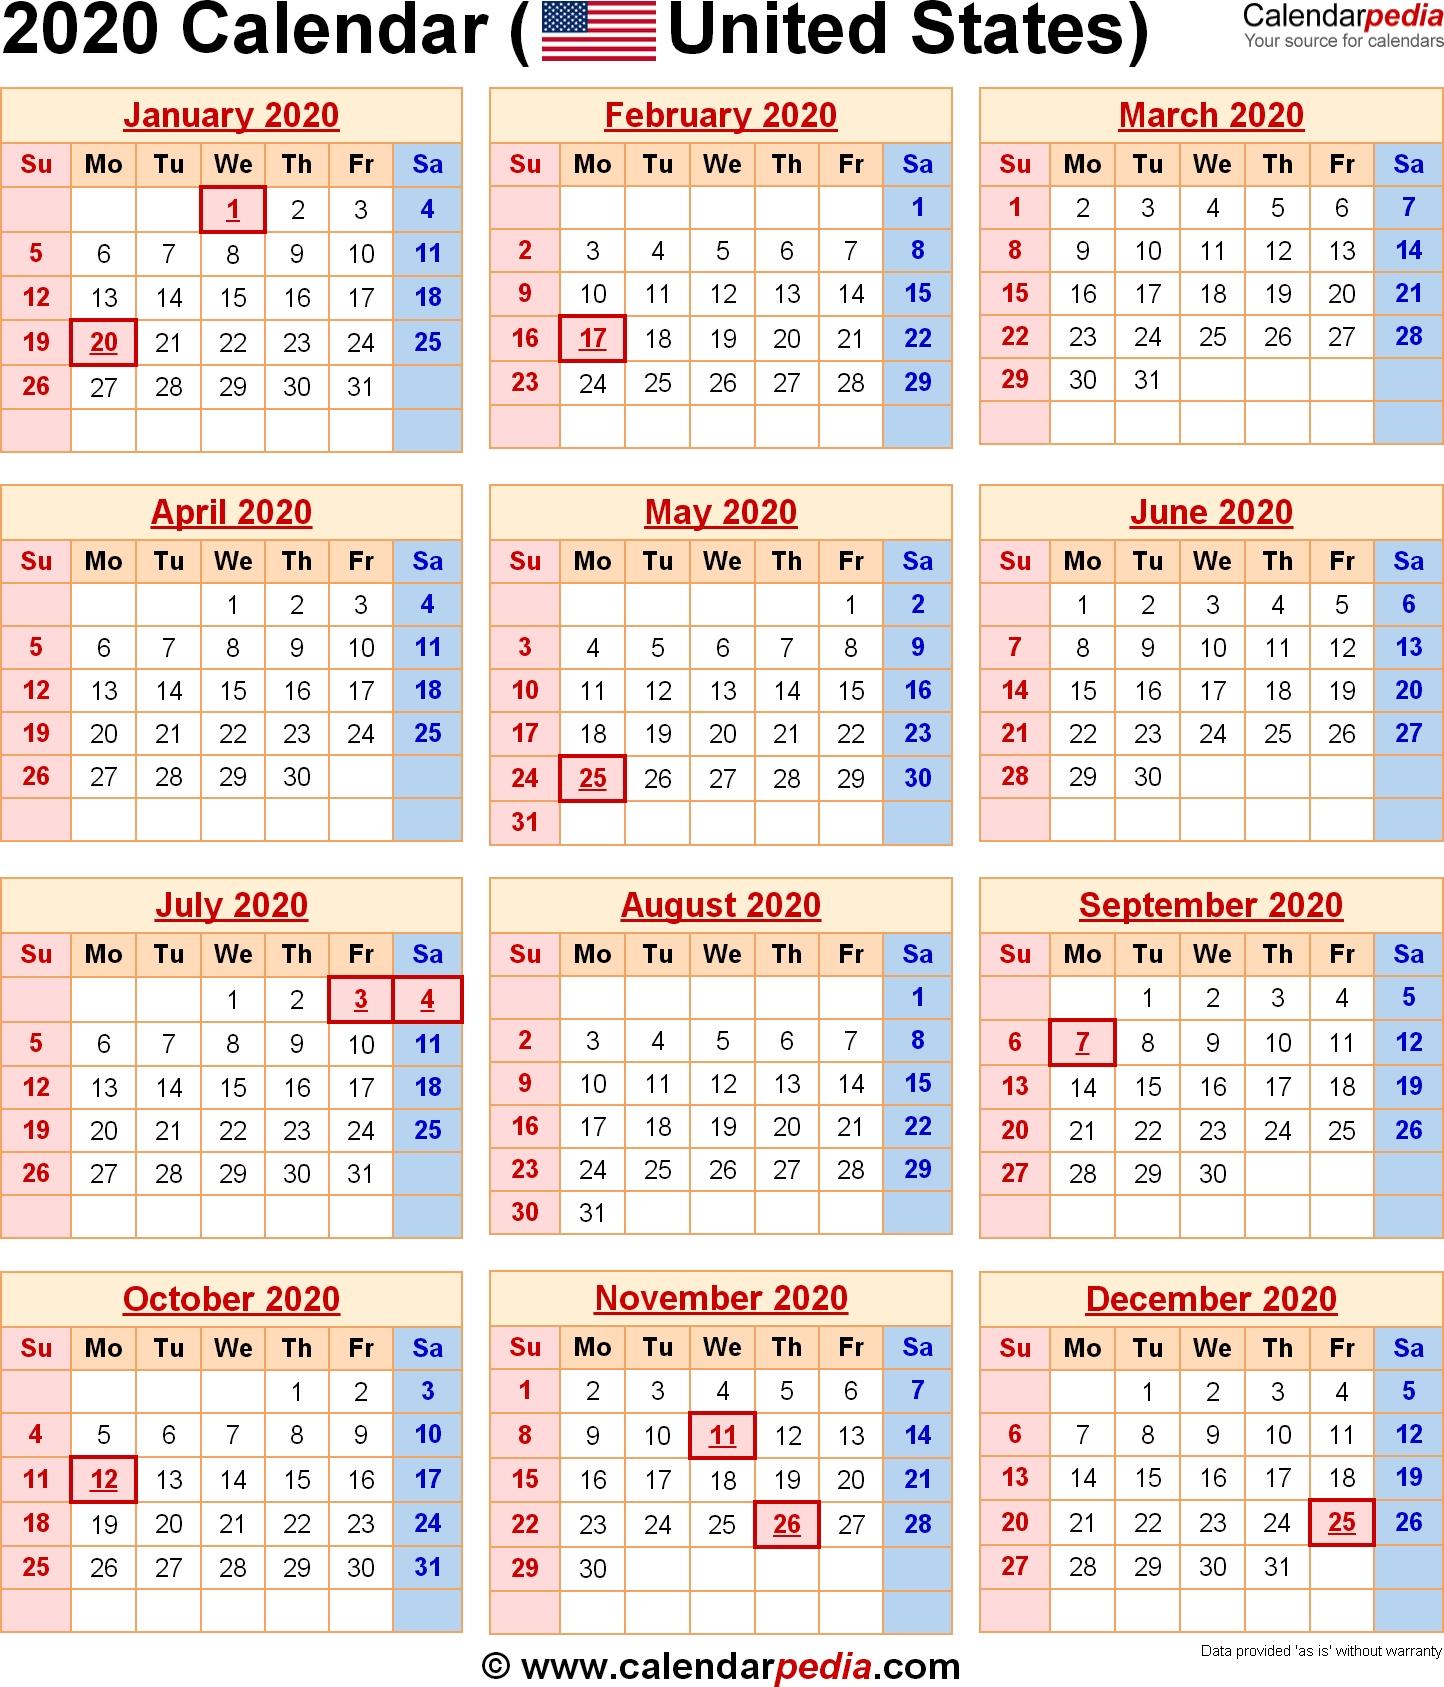 2020 Calendar With Federal Holidays & Excel/pdf/word Templates  Date Code Calendar 2020